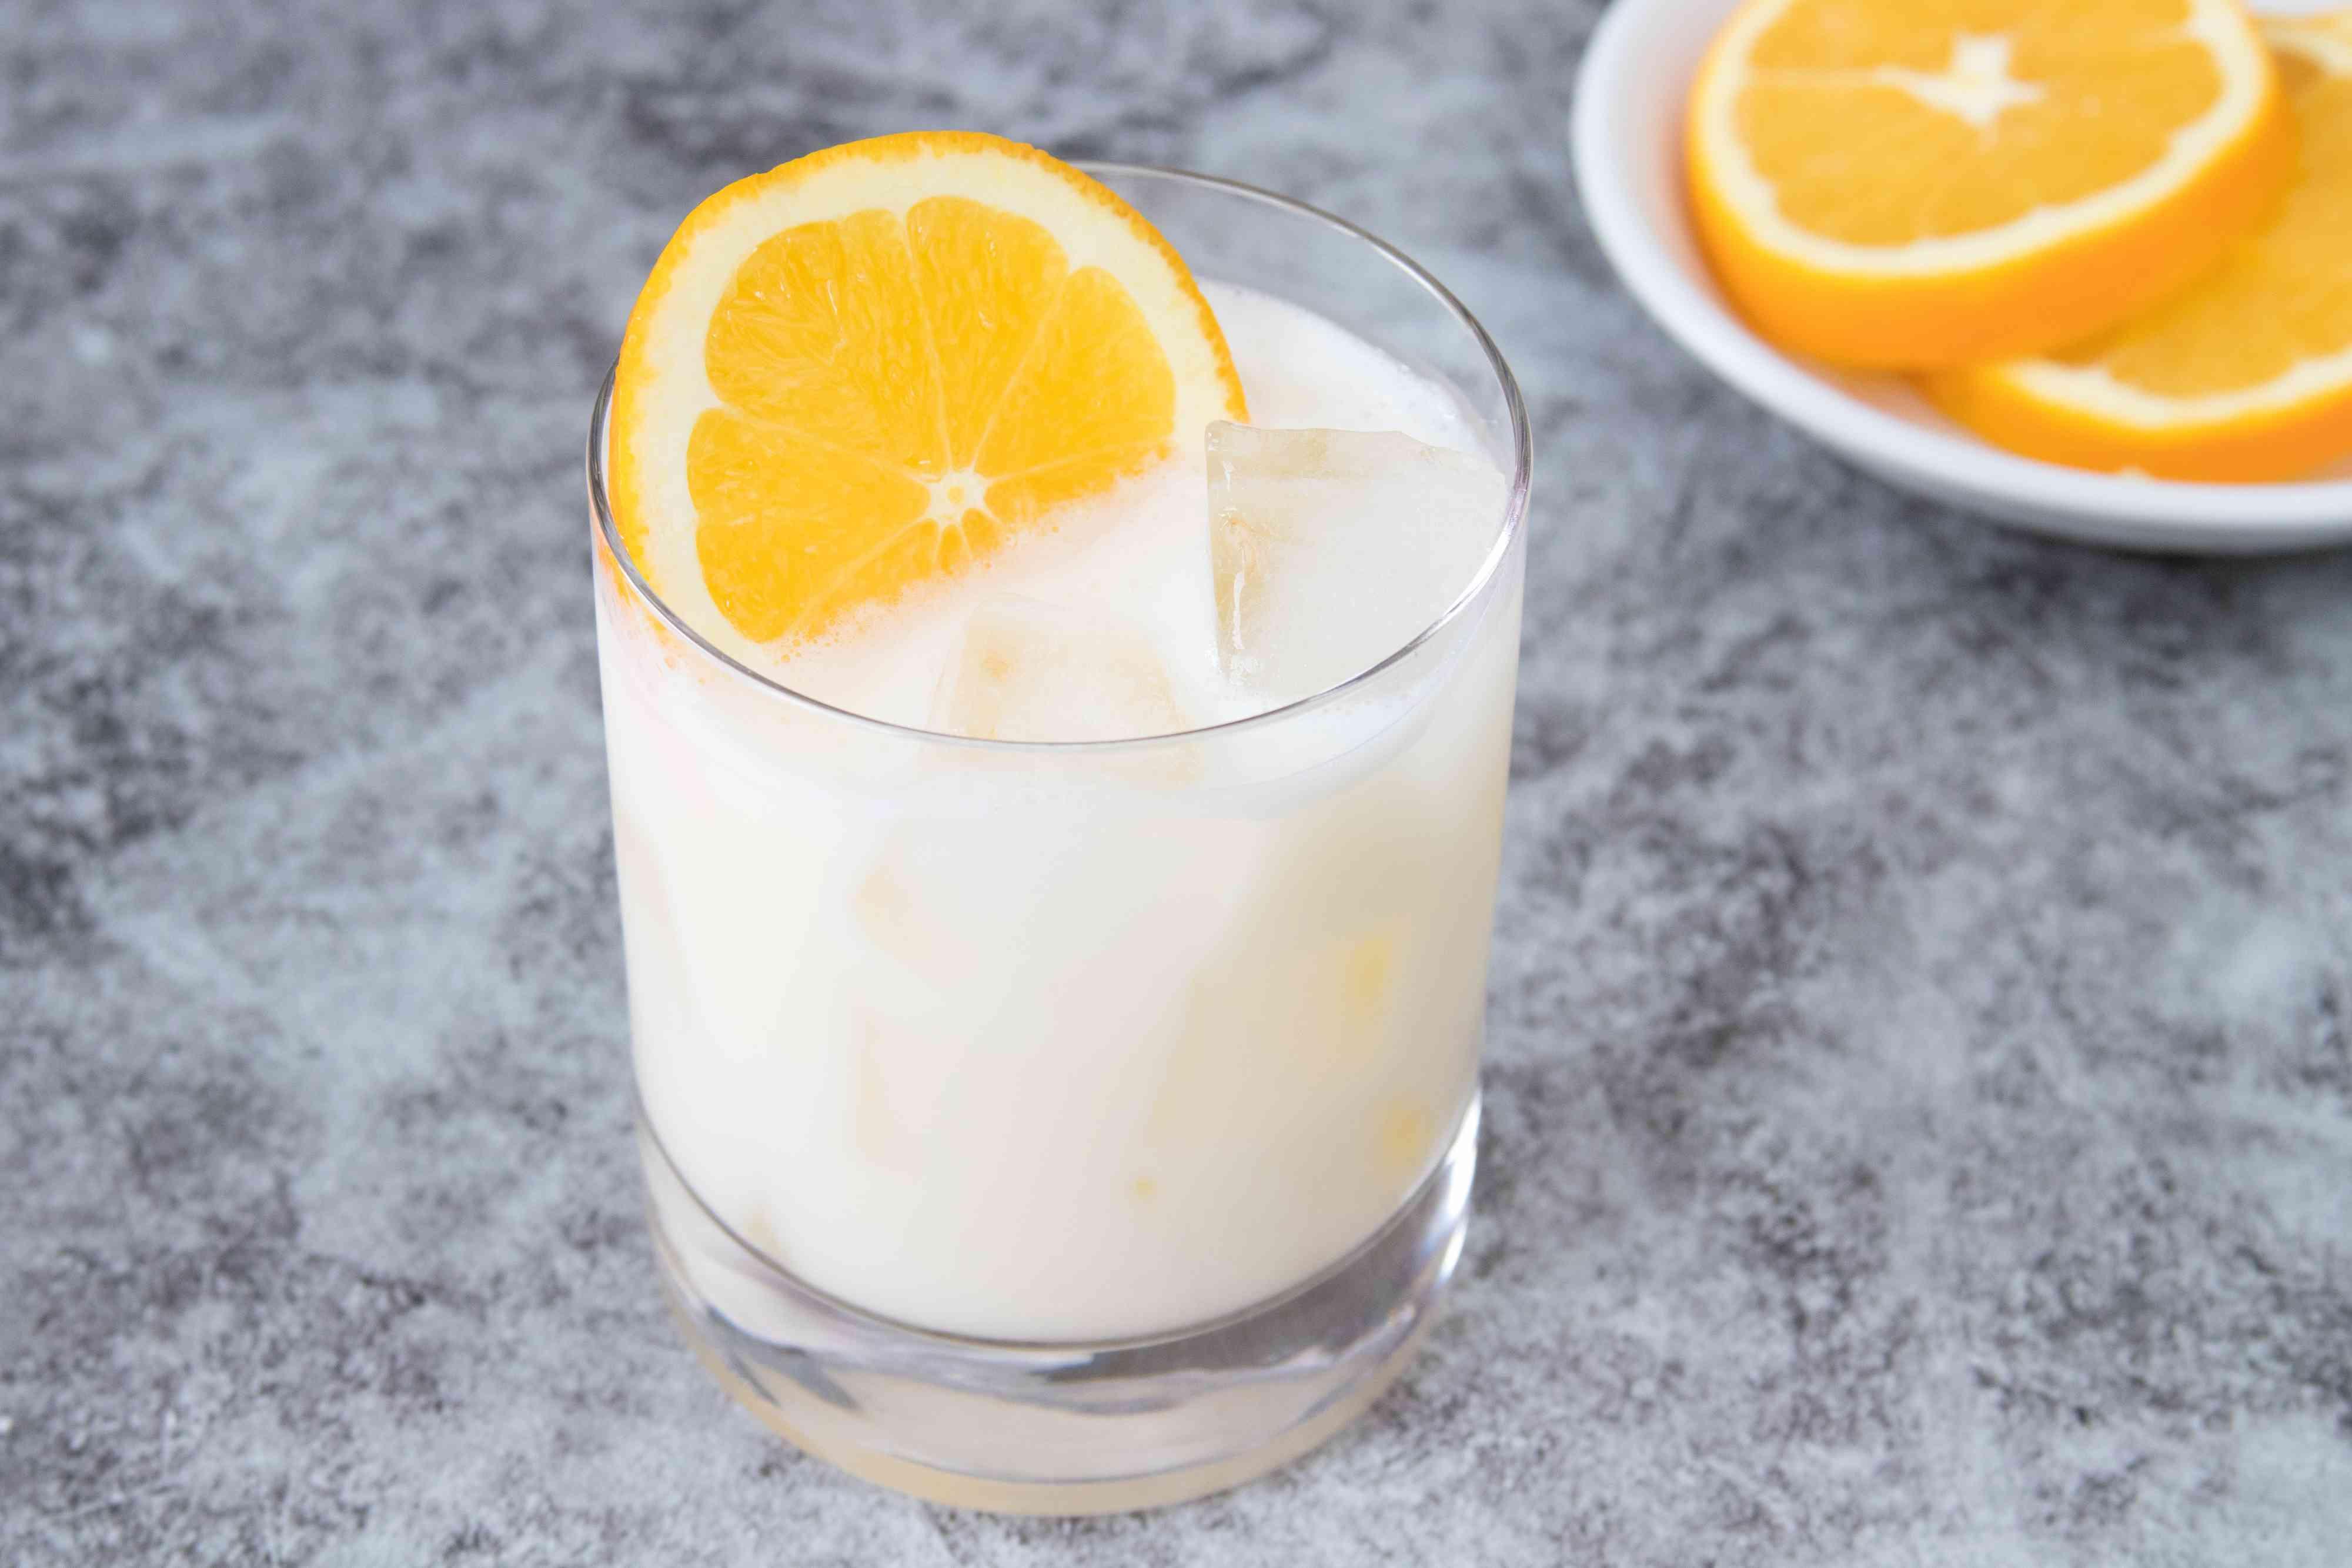 Orange creamsicle cocktail with orange slice garnish